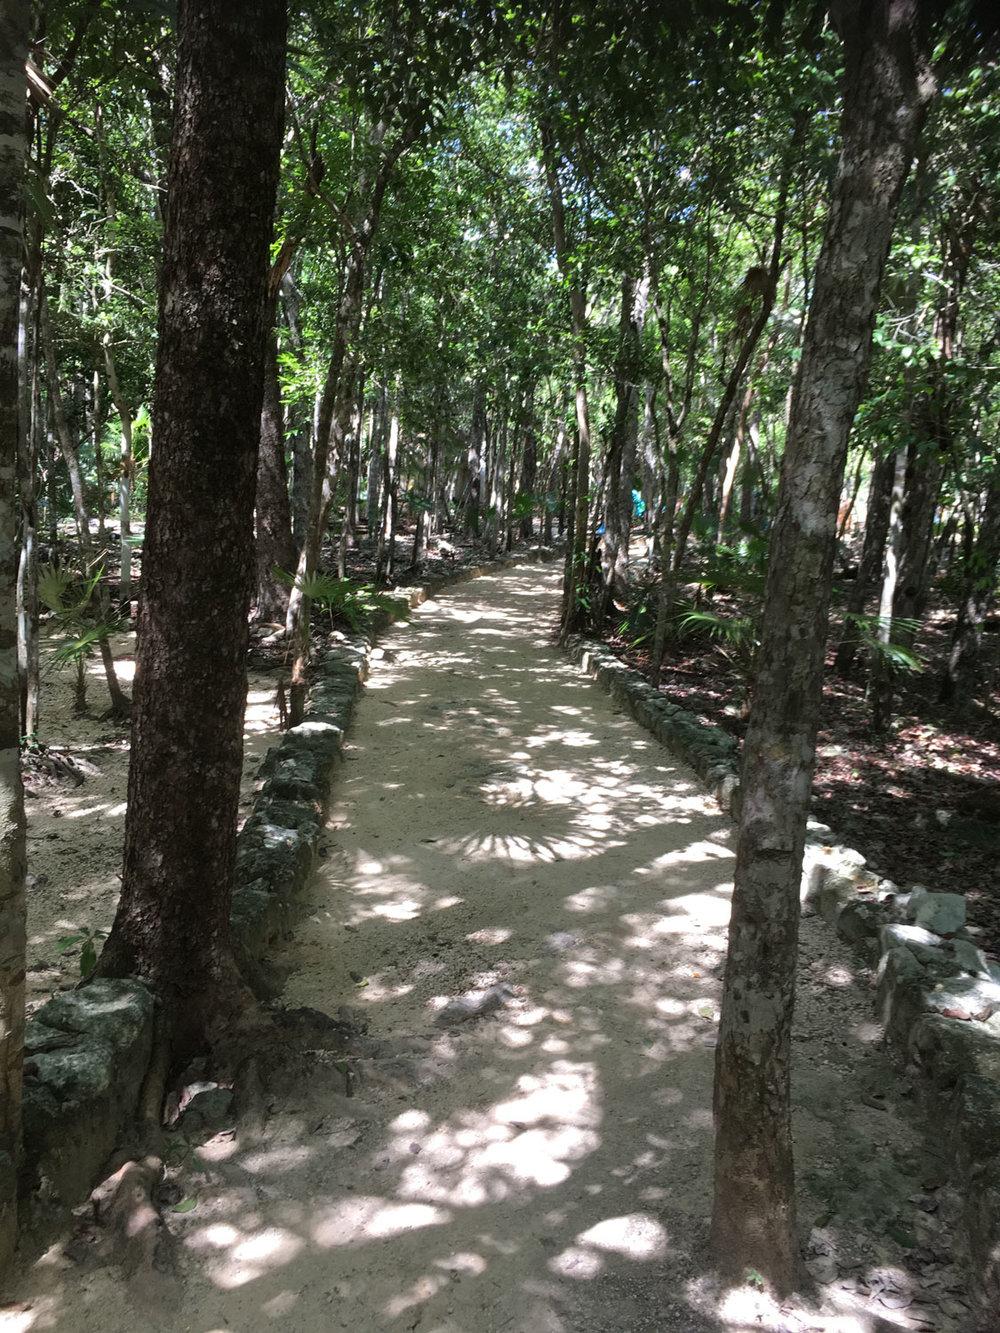 Hammocks_and_Ruins_Riviera_Maya_What_to_Do_Playa_Del_Carmen_Tulum_Cenotes_Cenote_Escondido_6.jpg